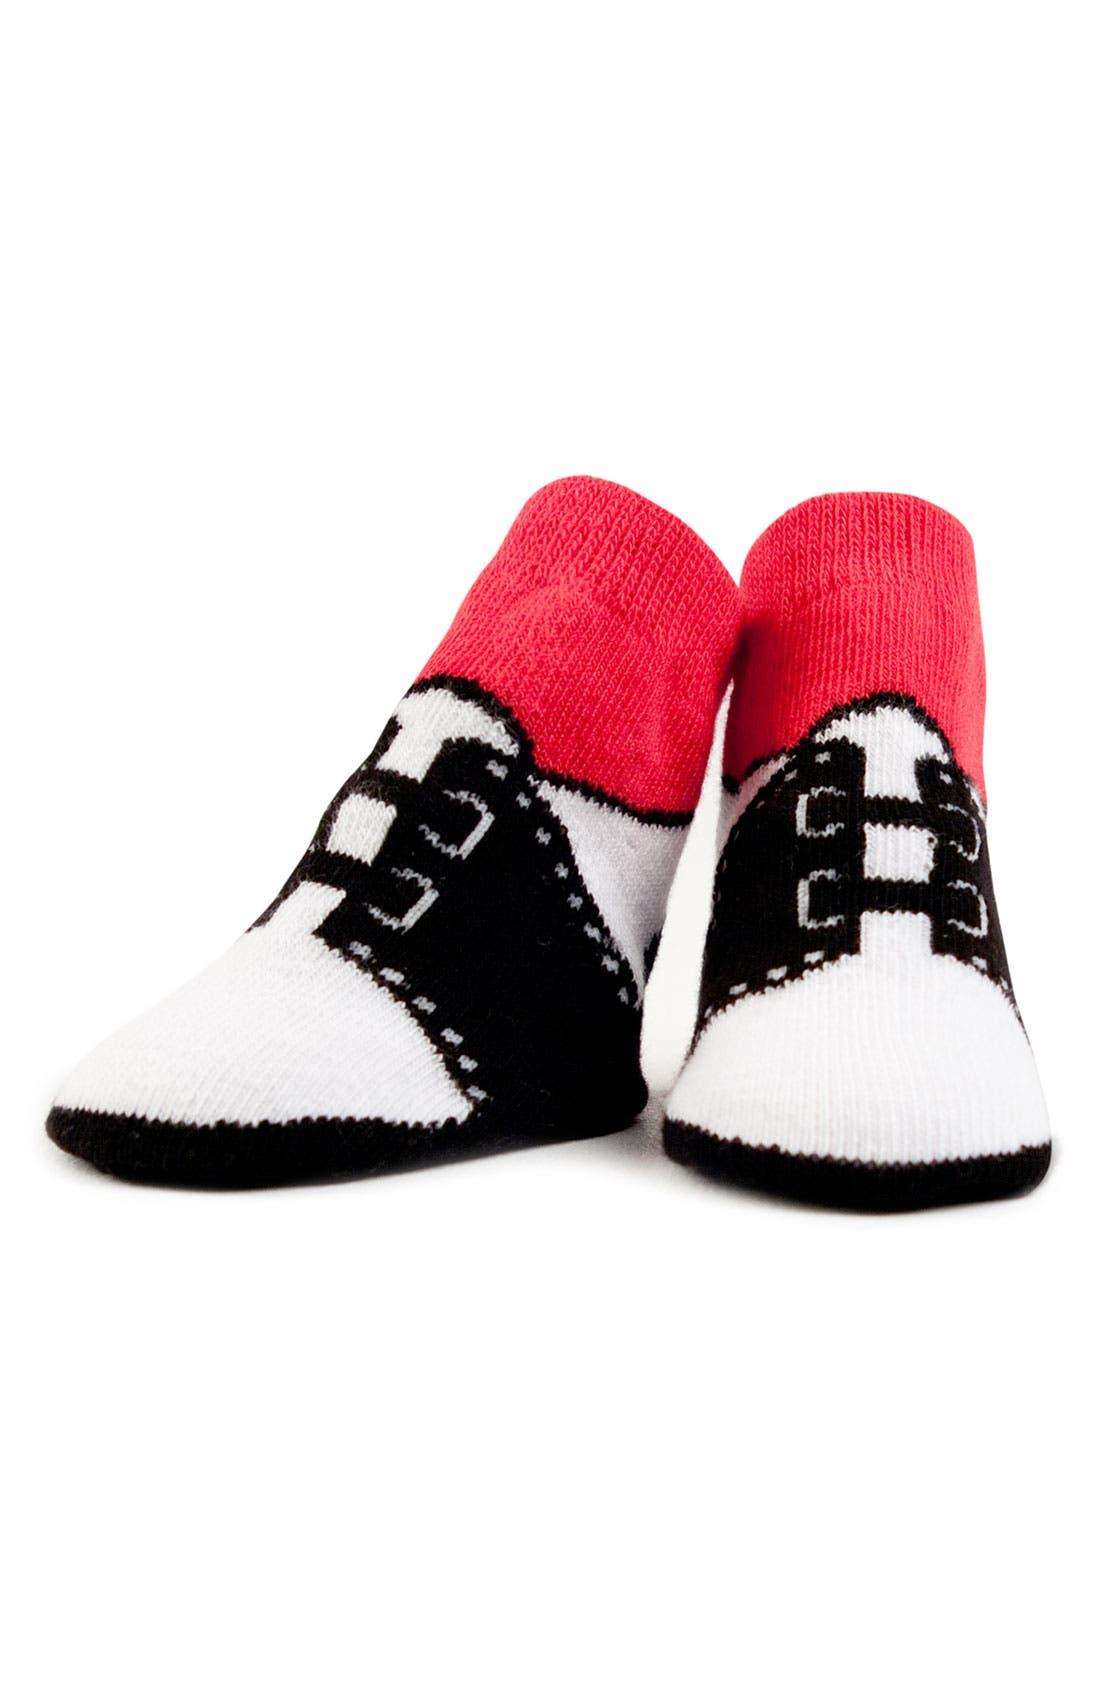 Alternate Image 2  - Trumpette Socks (Baby Boys)